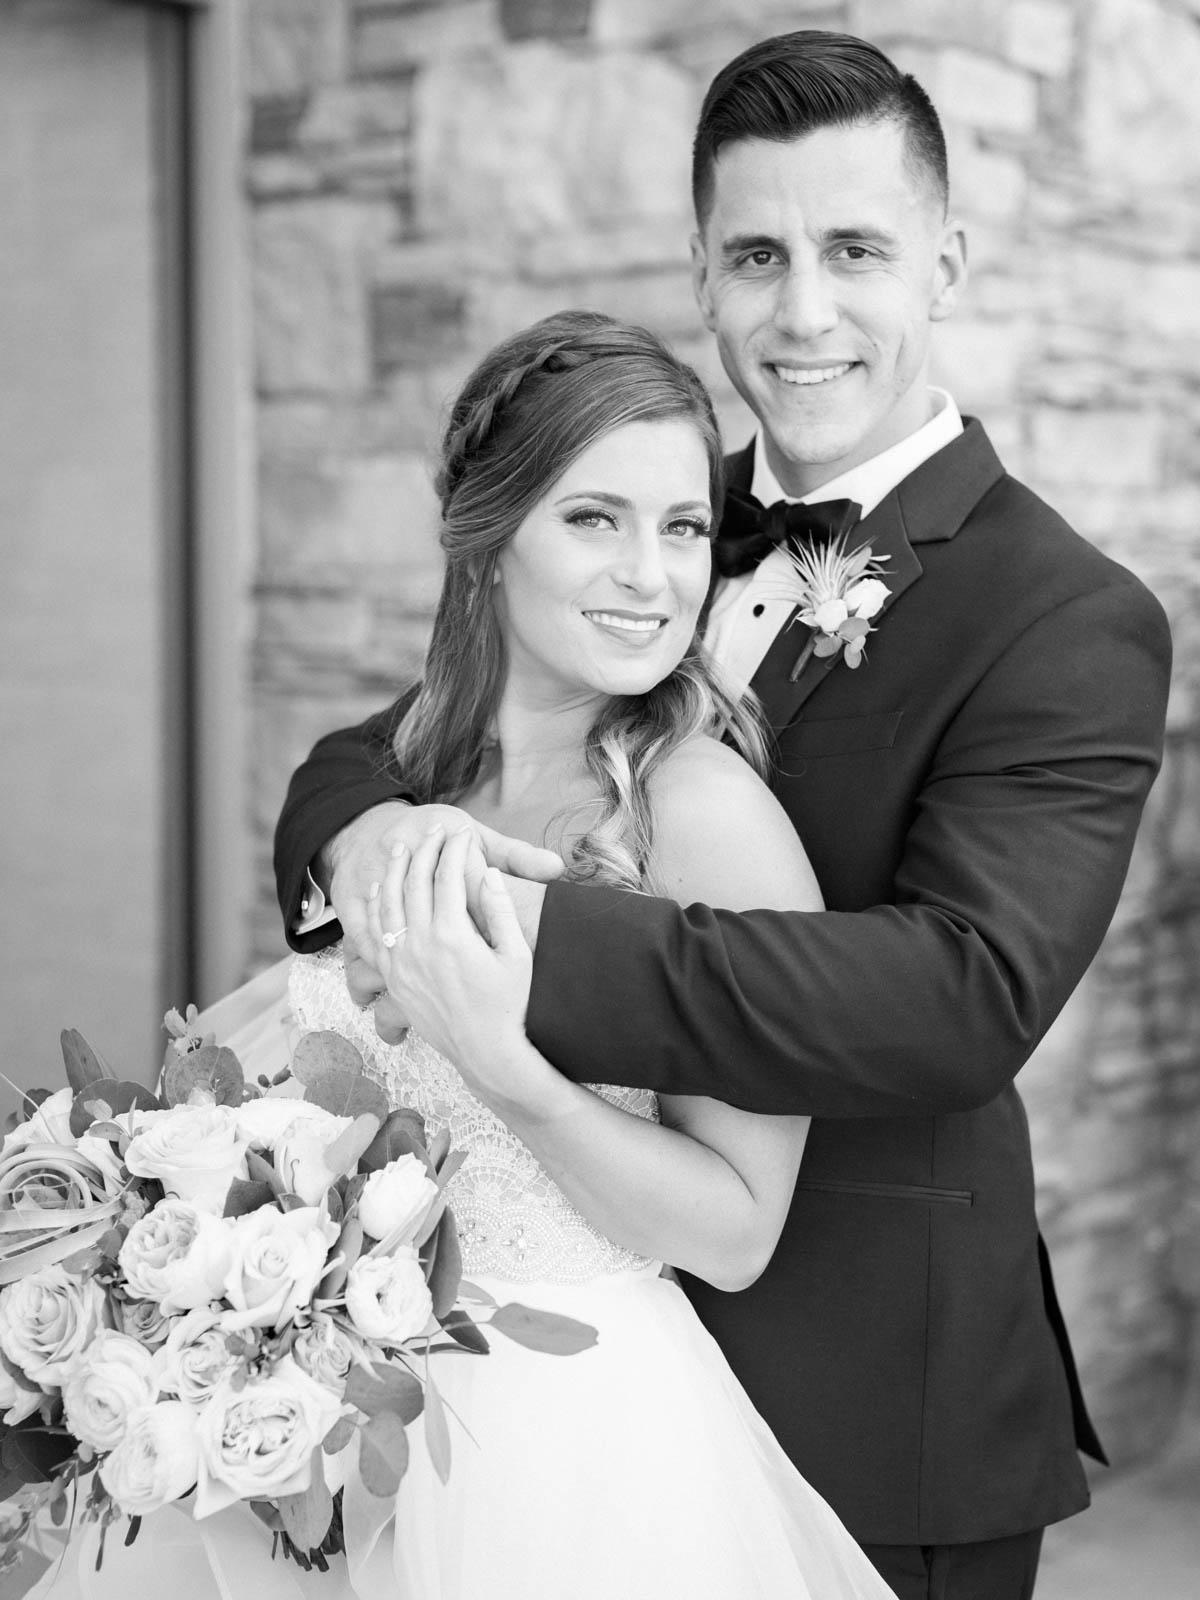 Starr Pass wedding captured by Tucson Wedding Photographers Betsy & John